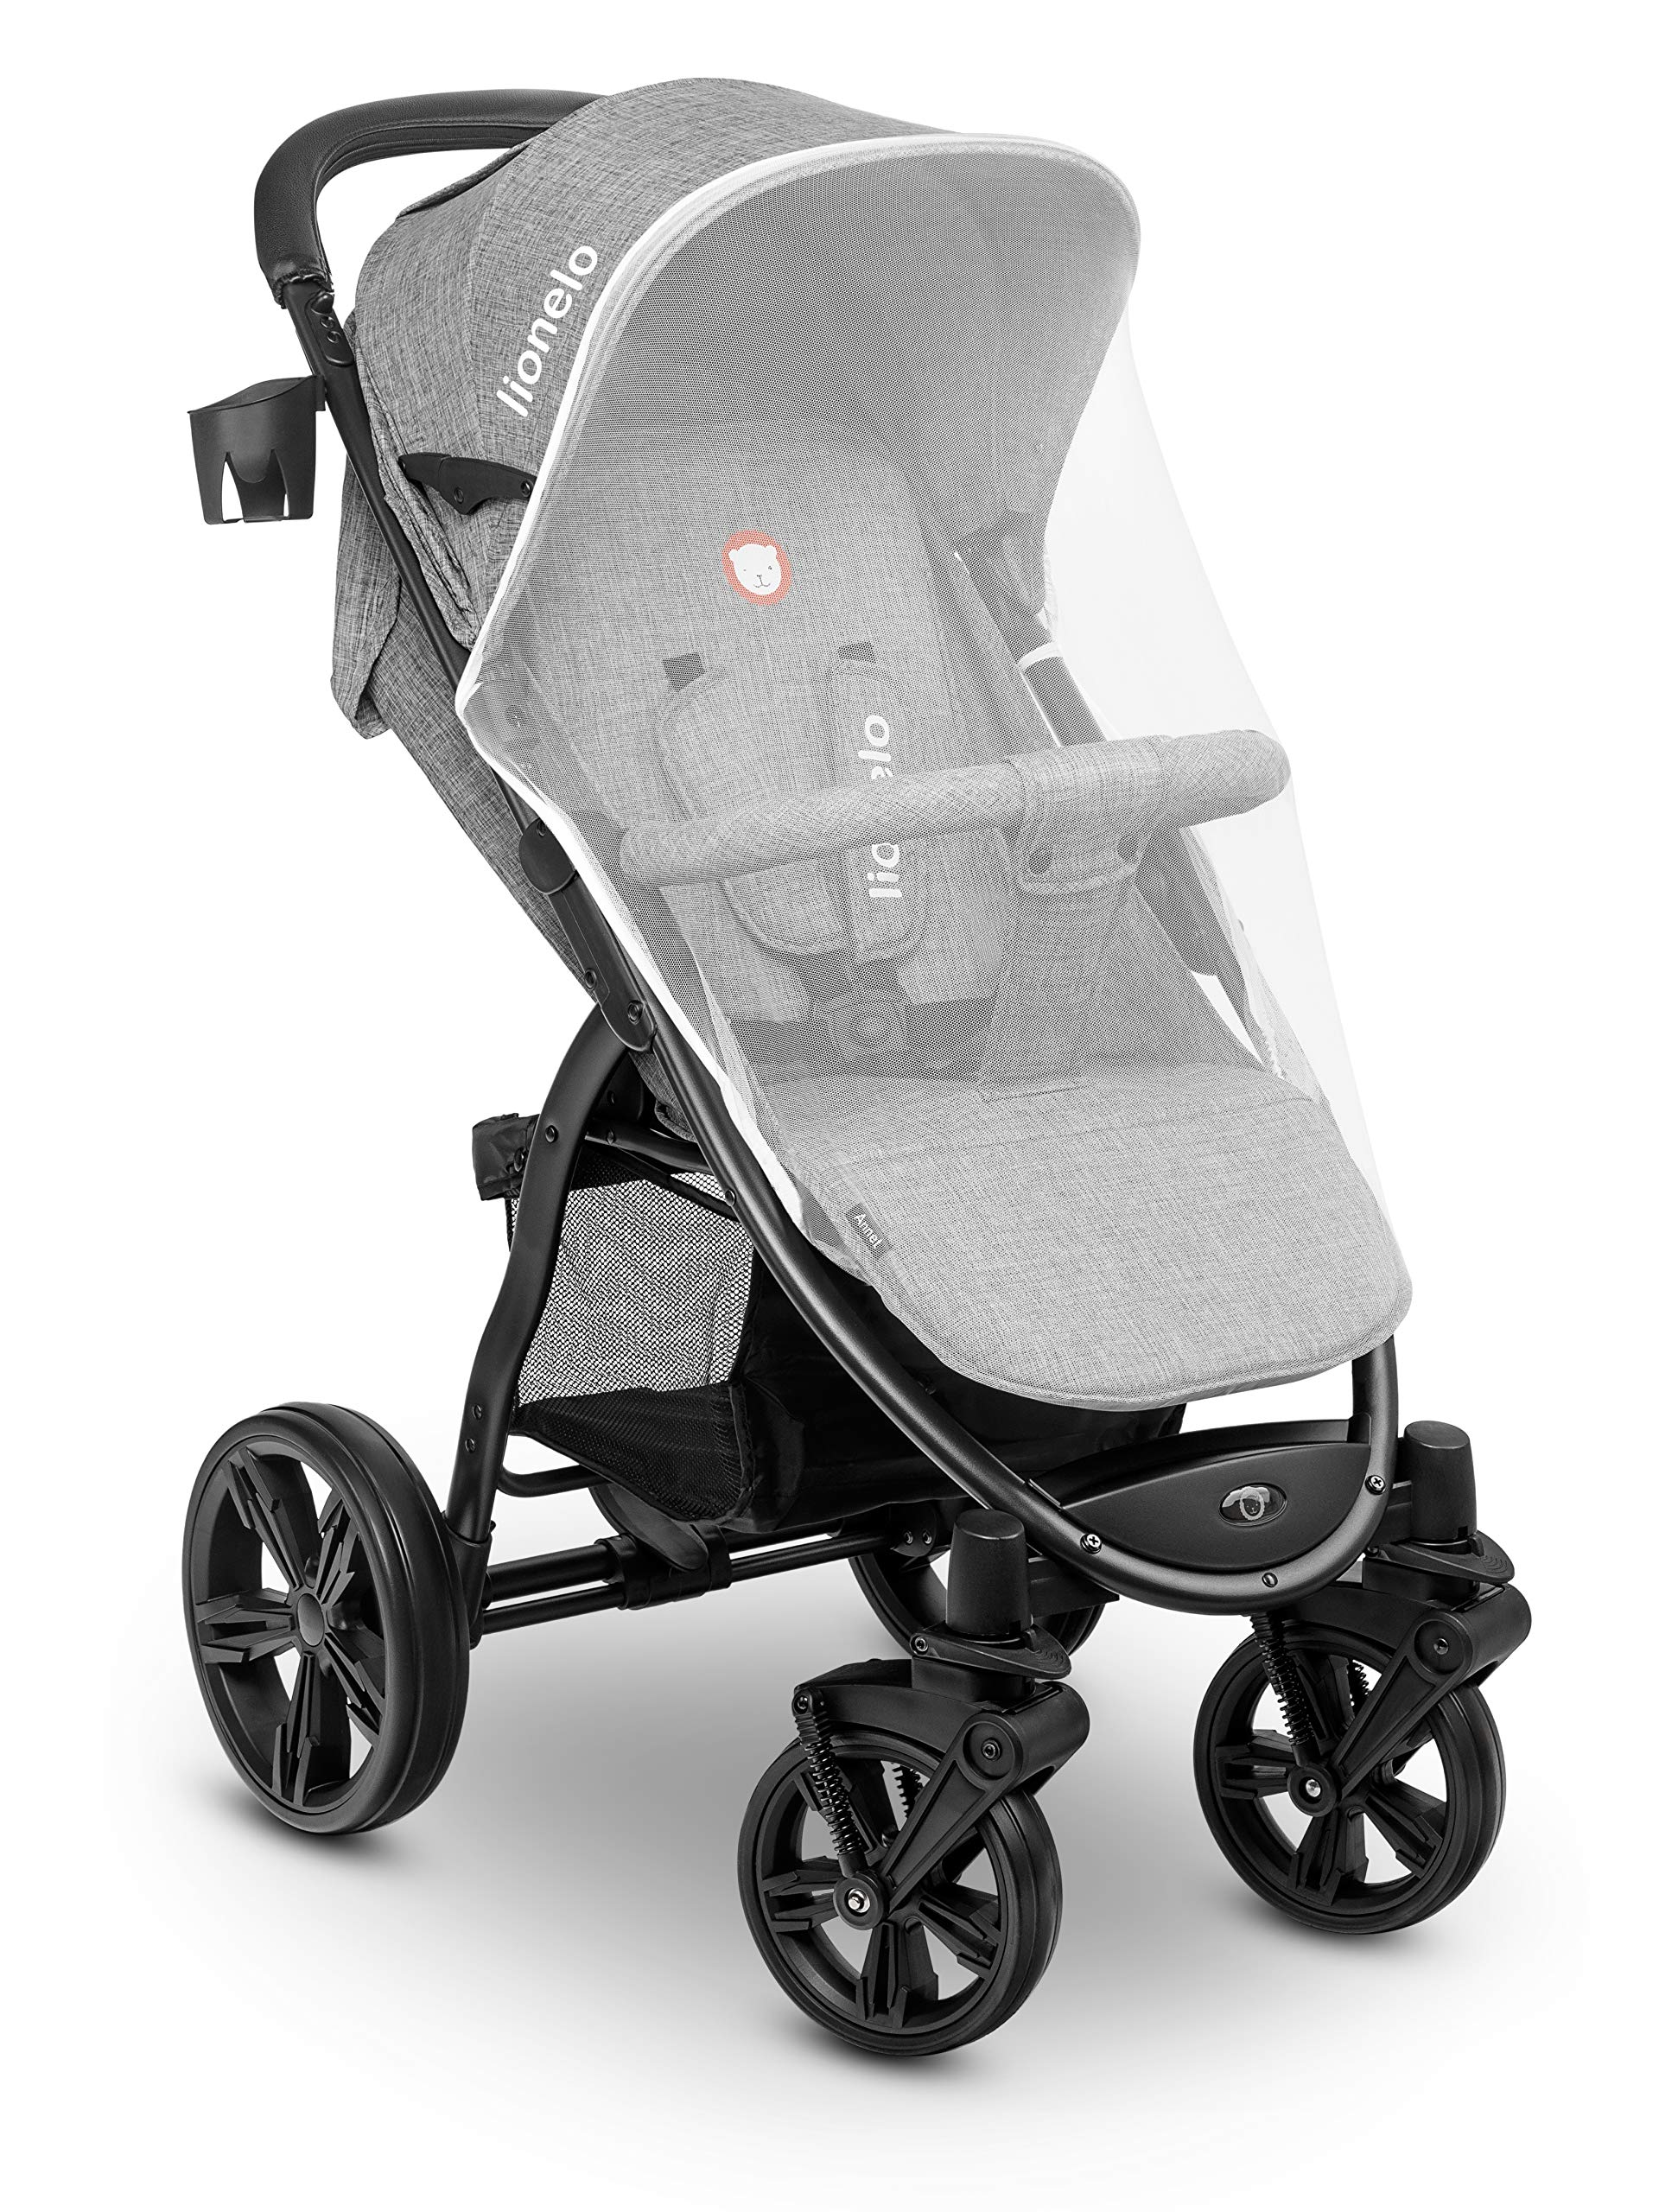 Lionelo 5902581656278 LO-Annet Concrete Stroller Pushchair (Light-Gray)   3